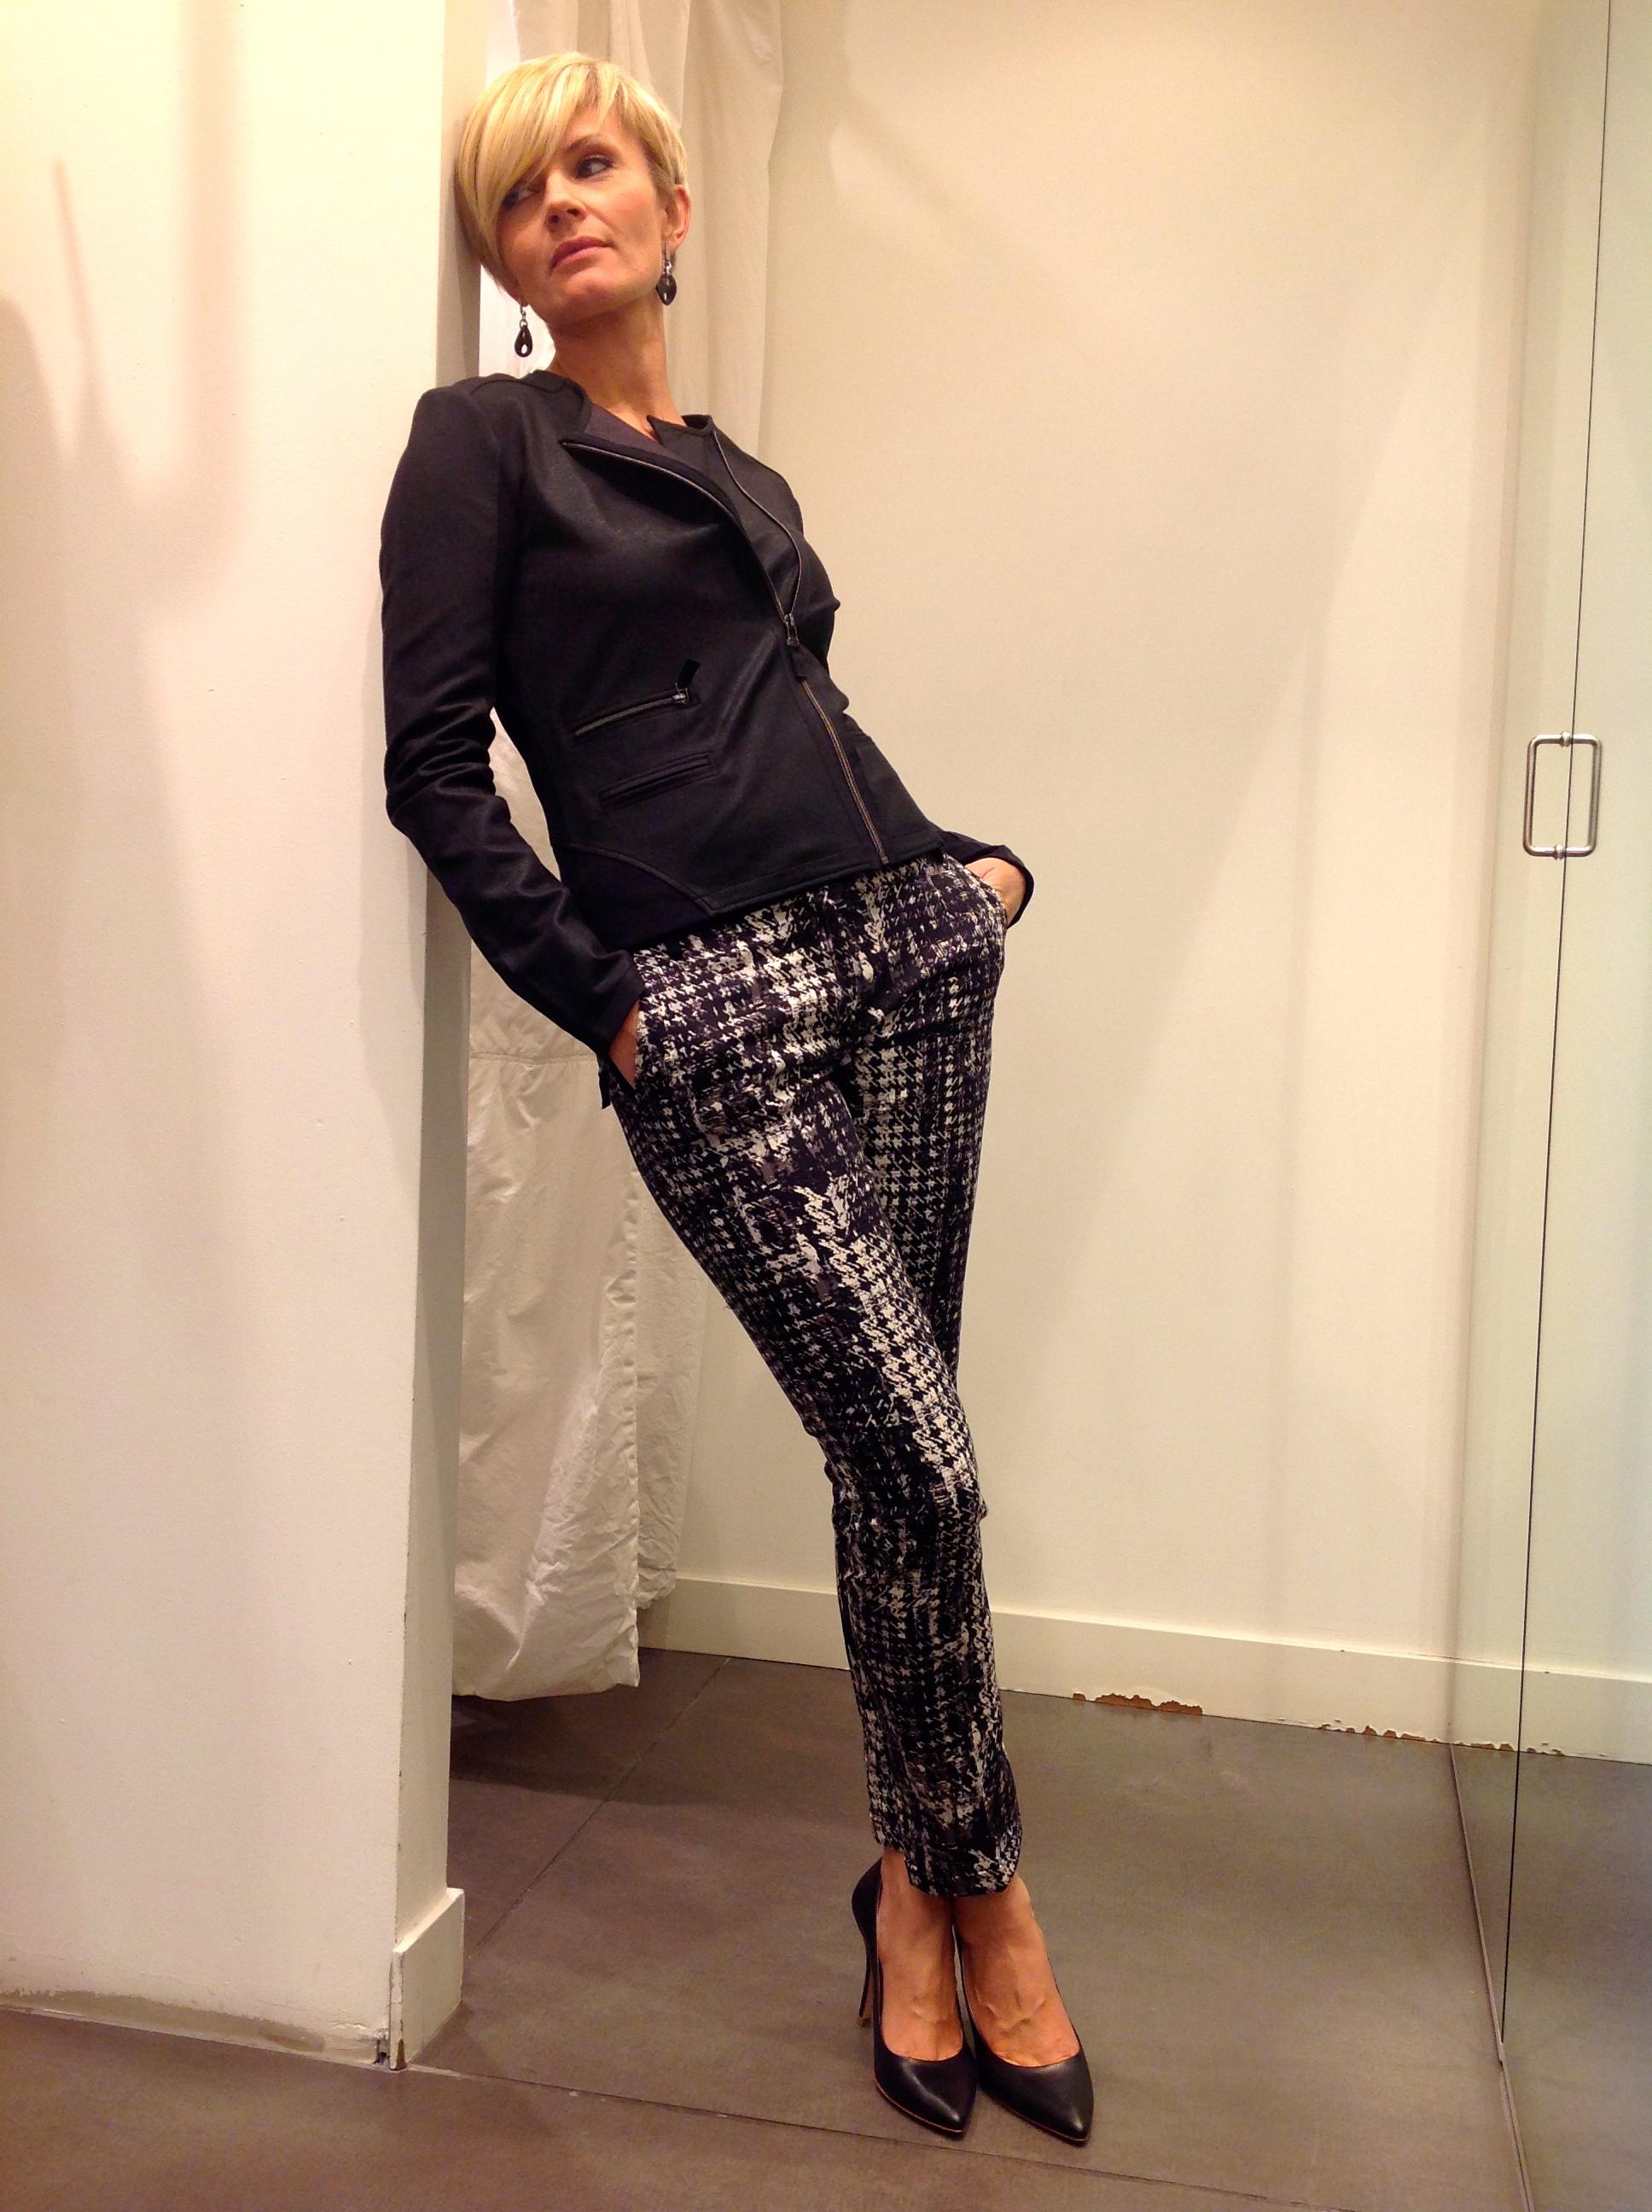 Outfit Pennyblack Via Gioberti Firenze